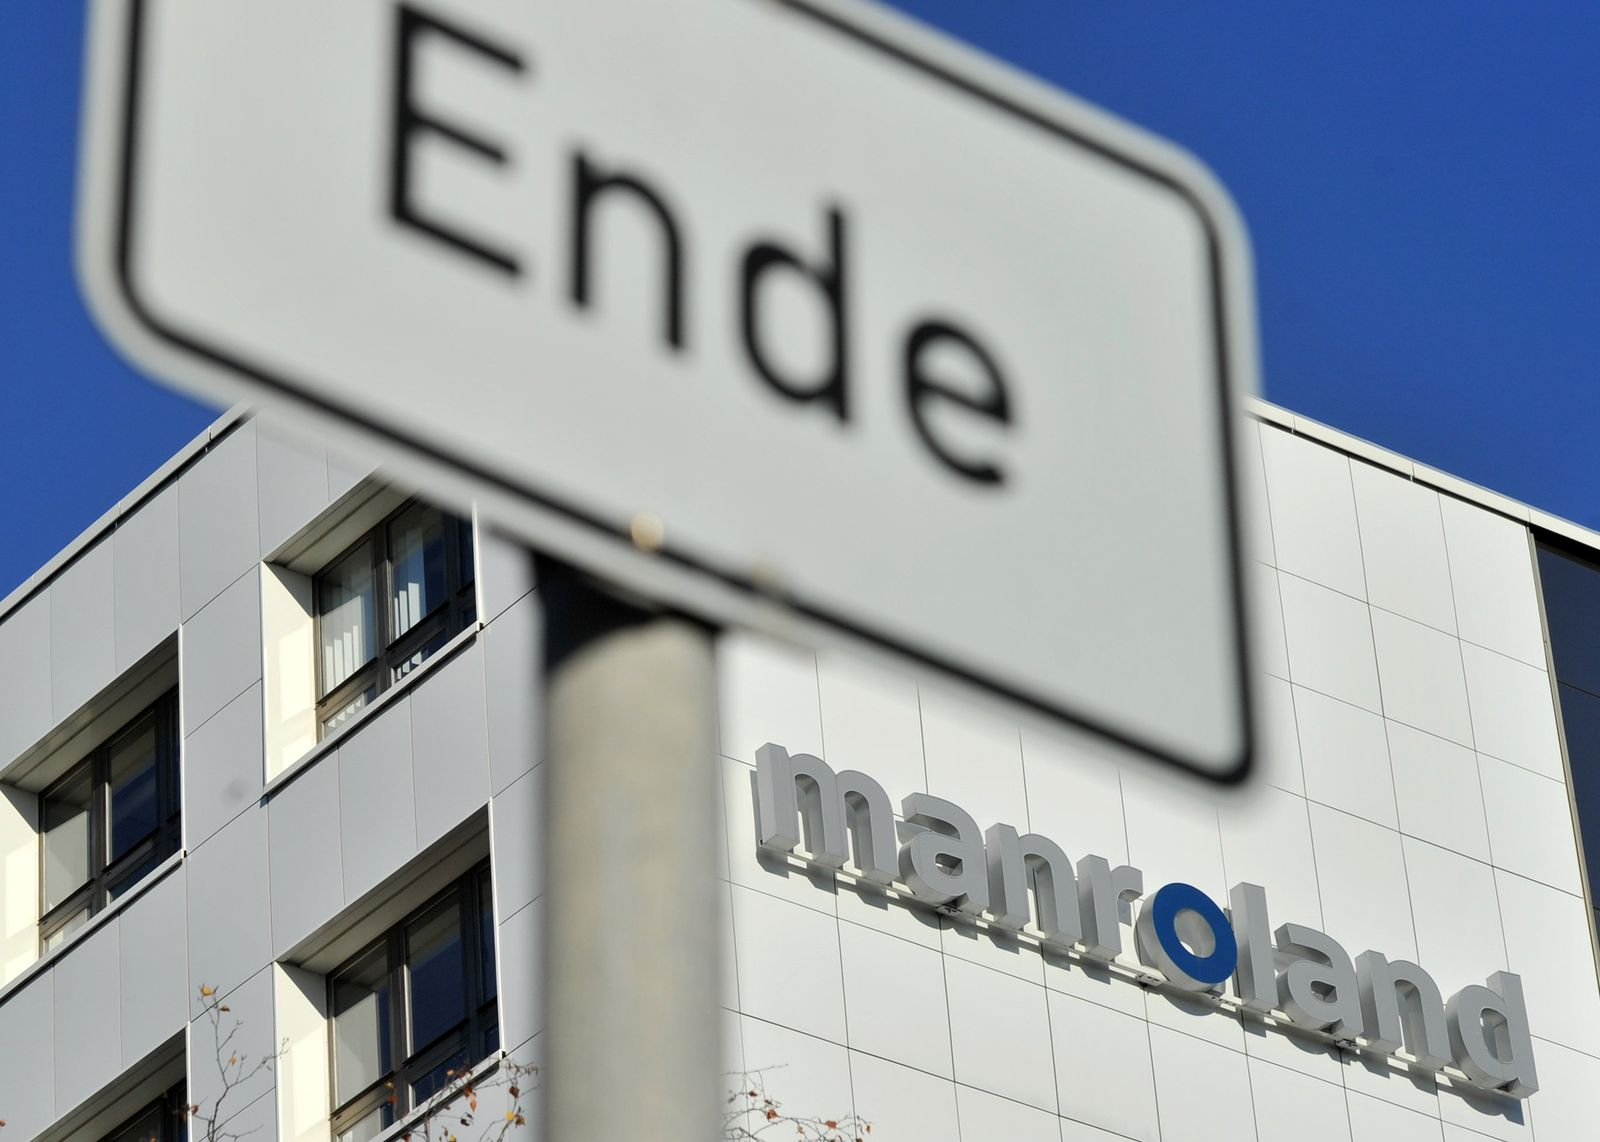 Manroland / Ende